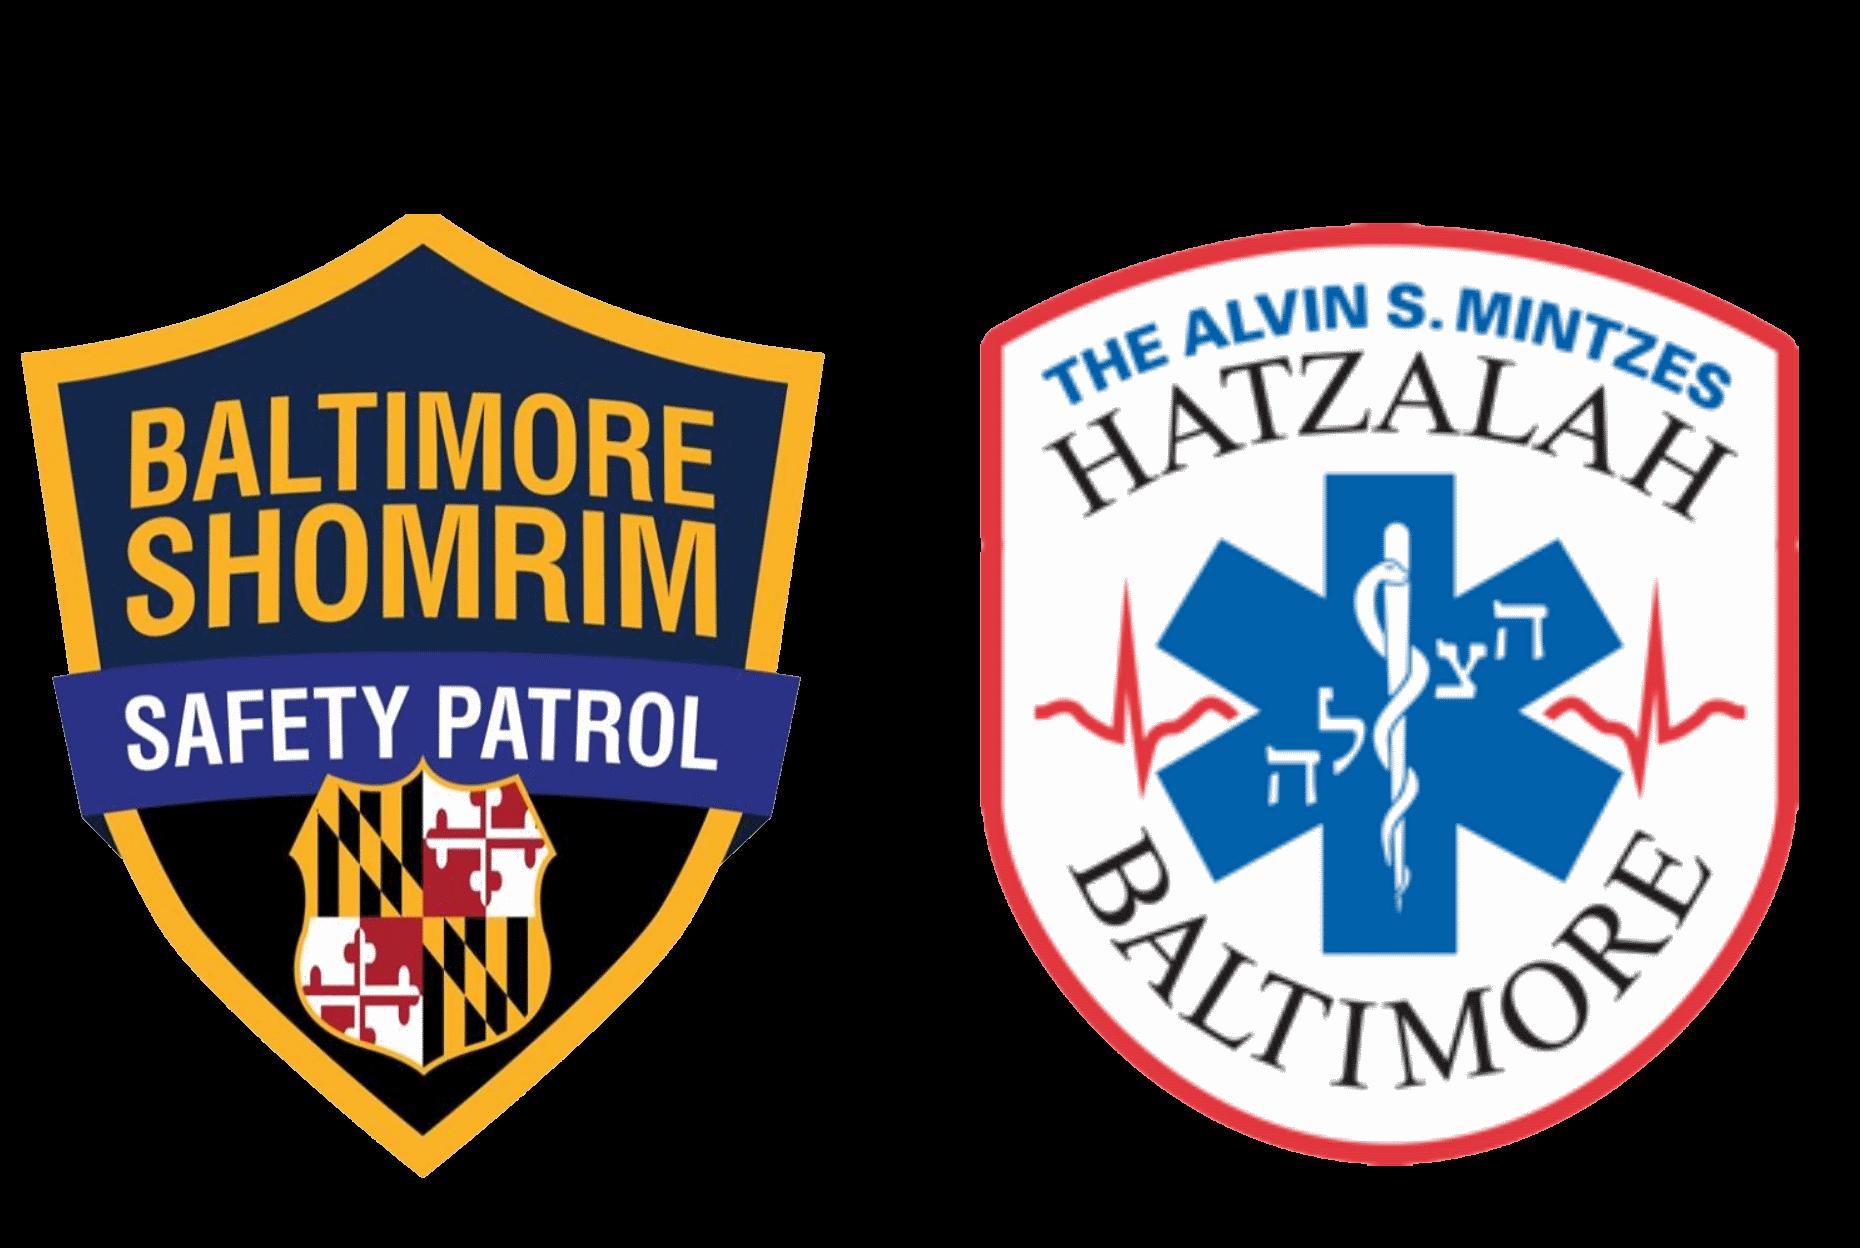 Shomrim and Hatzalah Logos